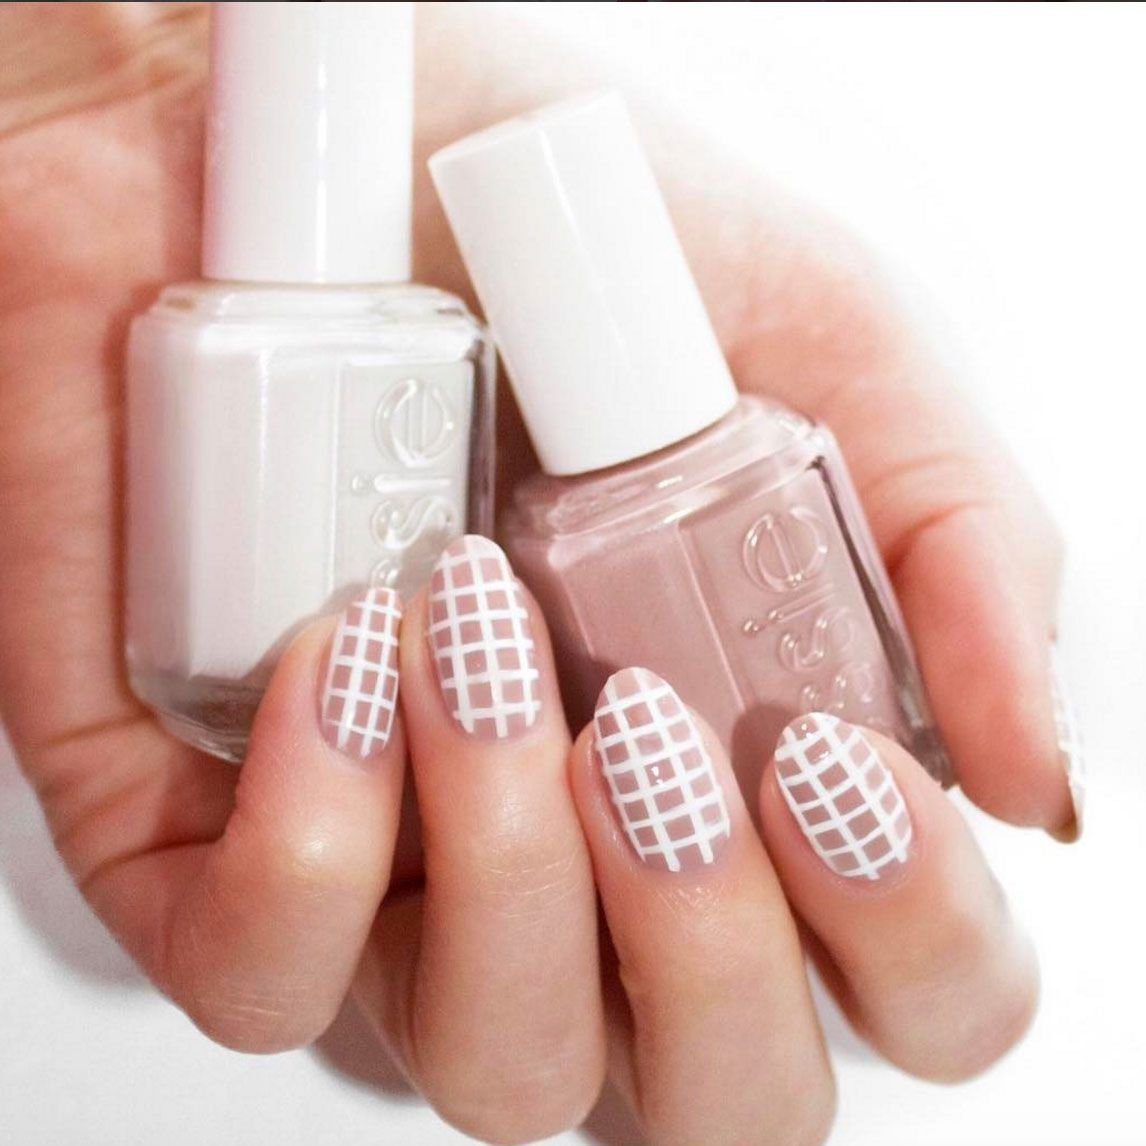 34 Fall Nail Designs for 2017 - Cute Autumn Manicure Ideas